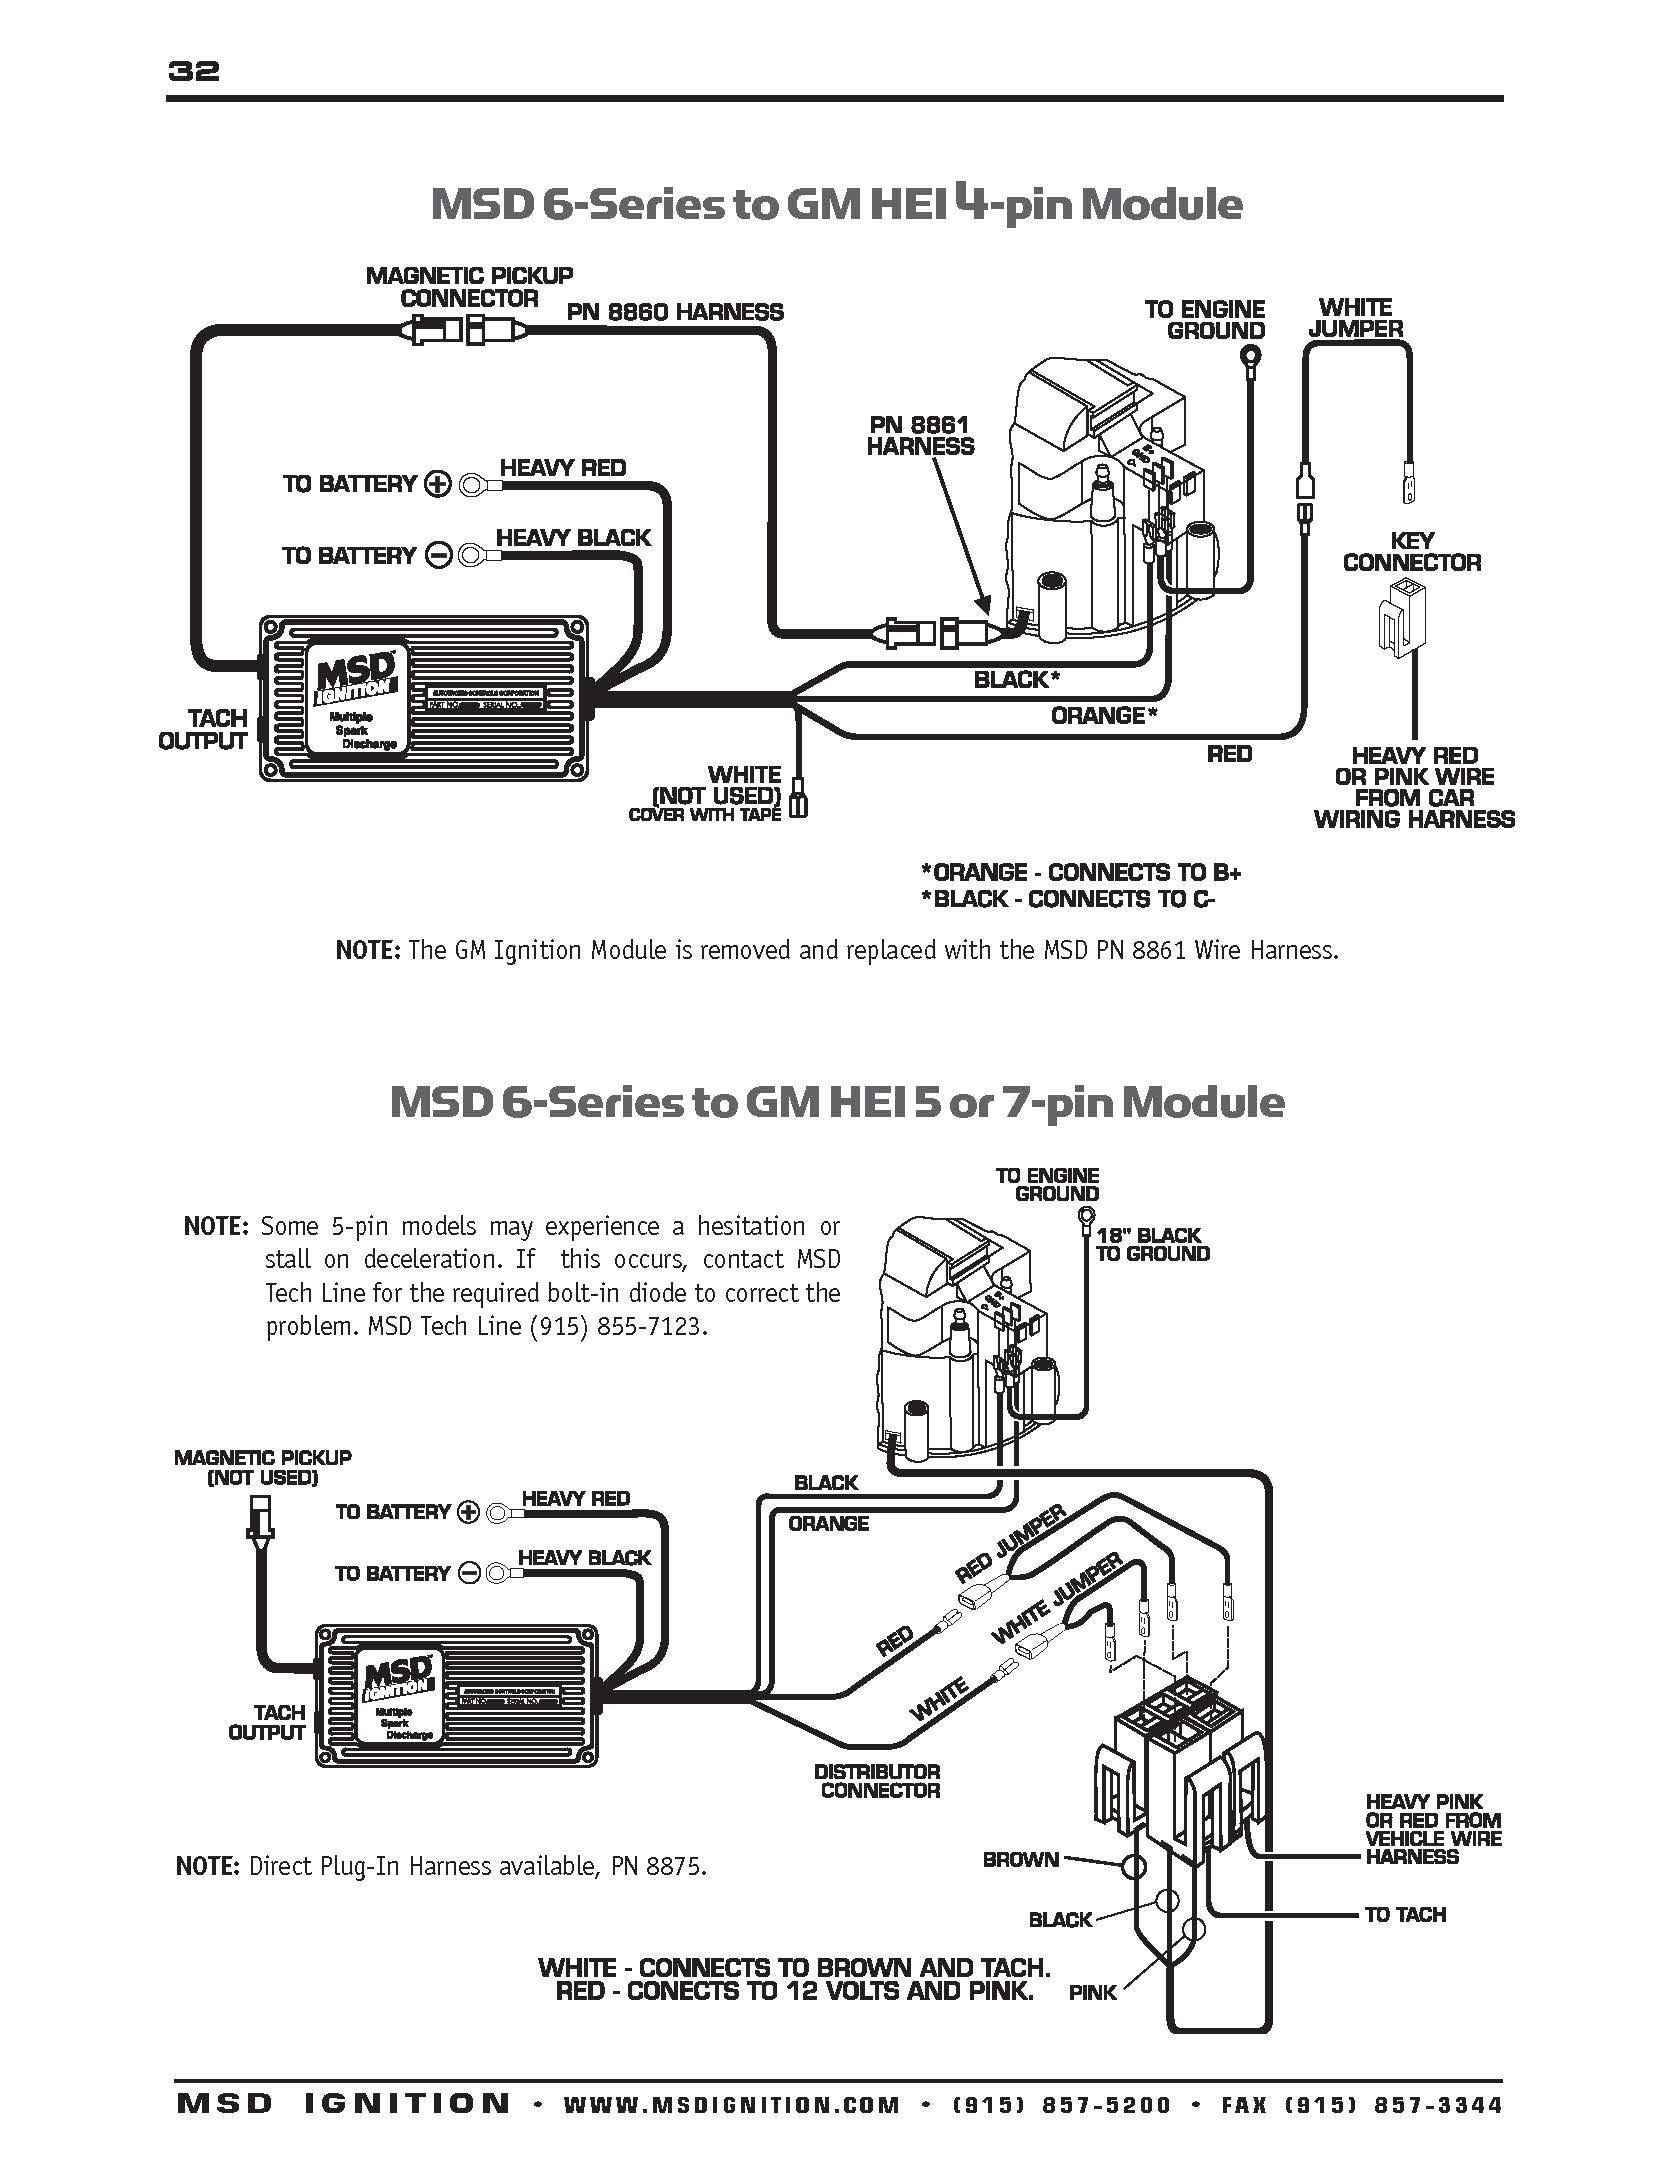 ignition coil wiring wiring diagram now rh 1 opqws madeagleband de